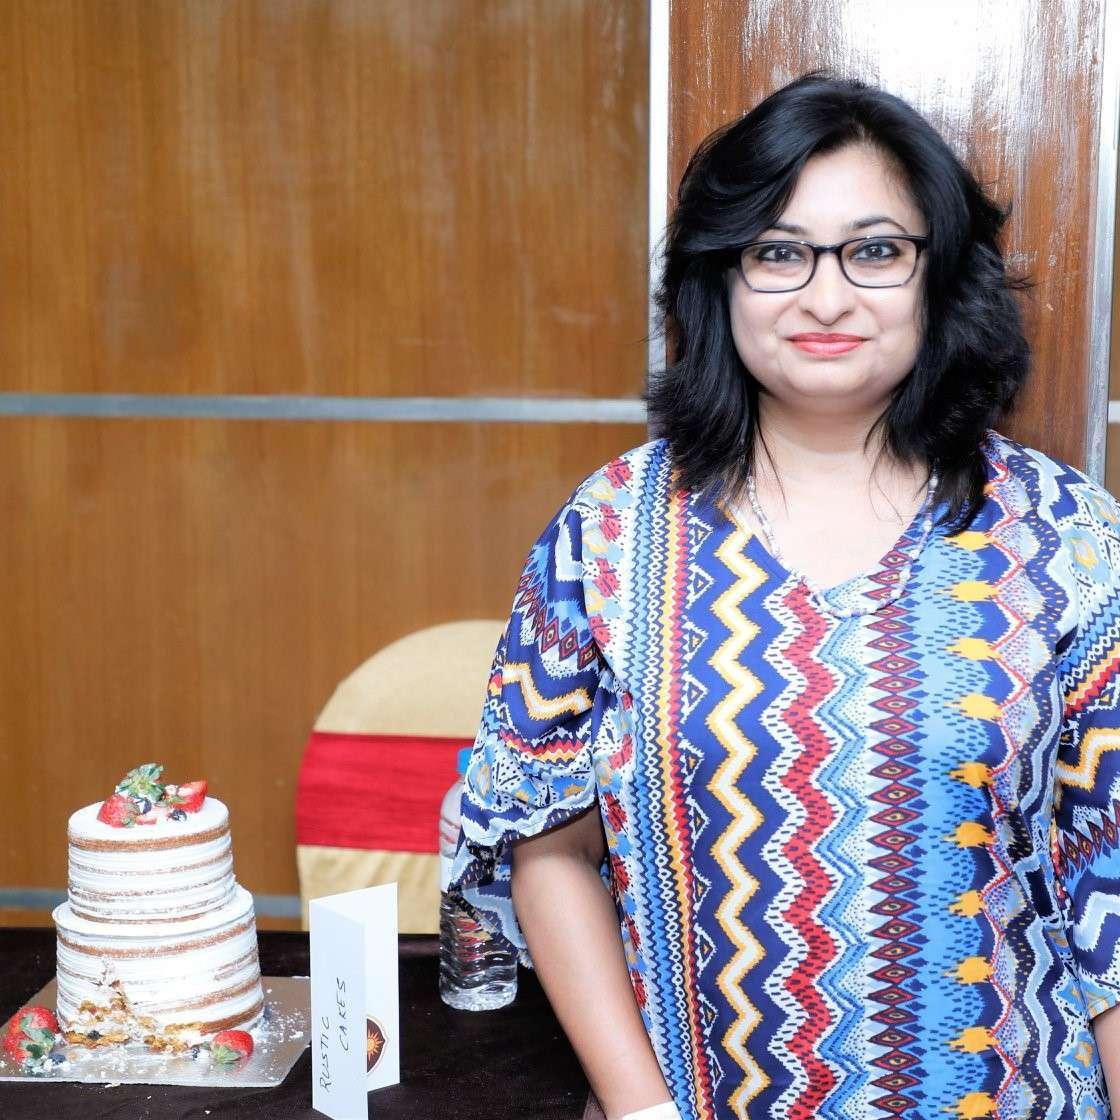 Rustic Cake Winner Basabi Sarkar